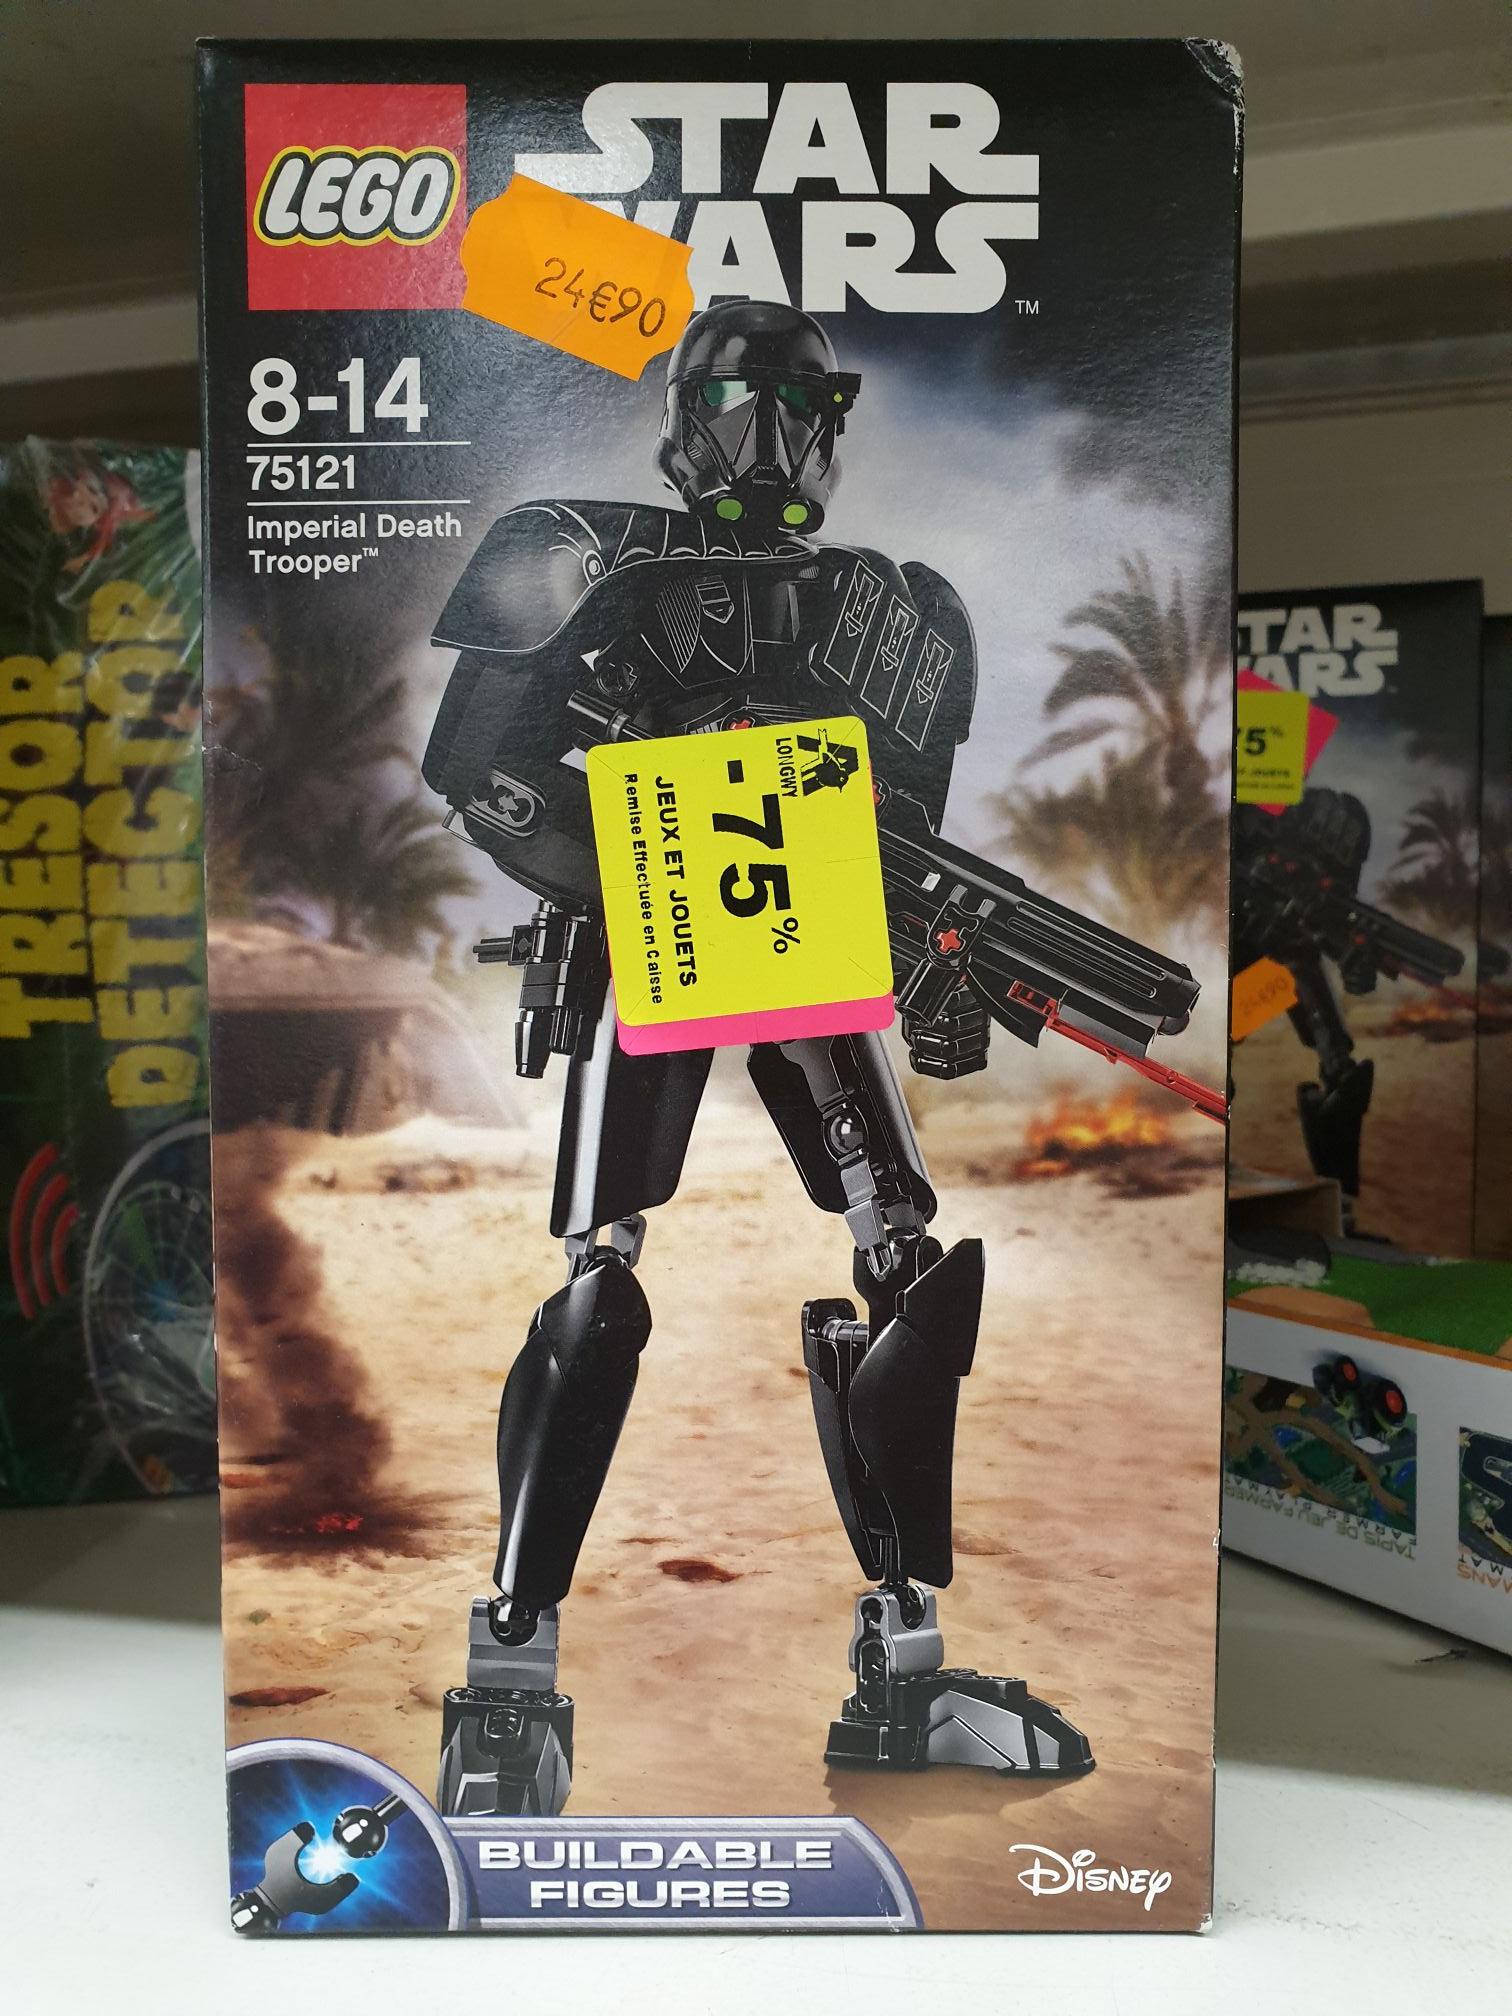 Jouet Lego Star Wars Imperial Death Trooper - Mont-Saint-Martin (54)